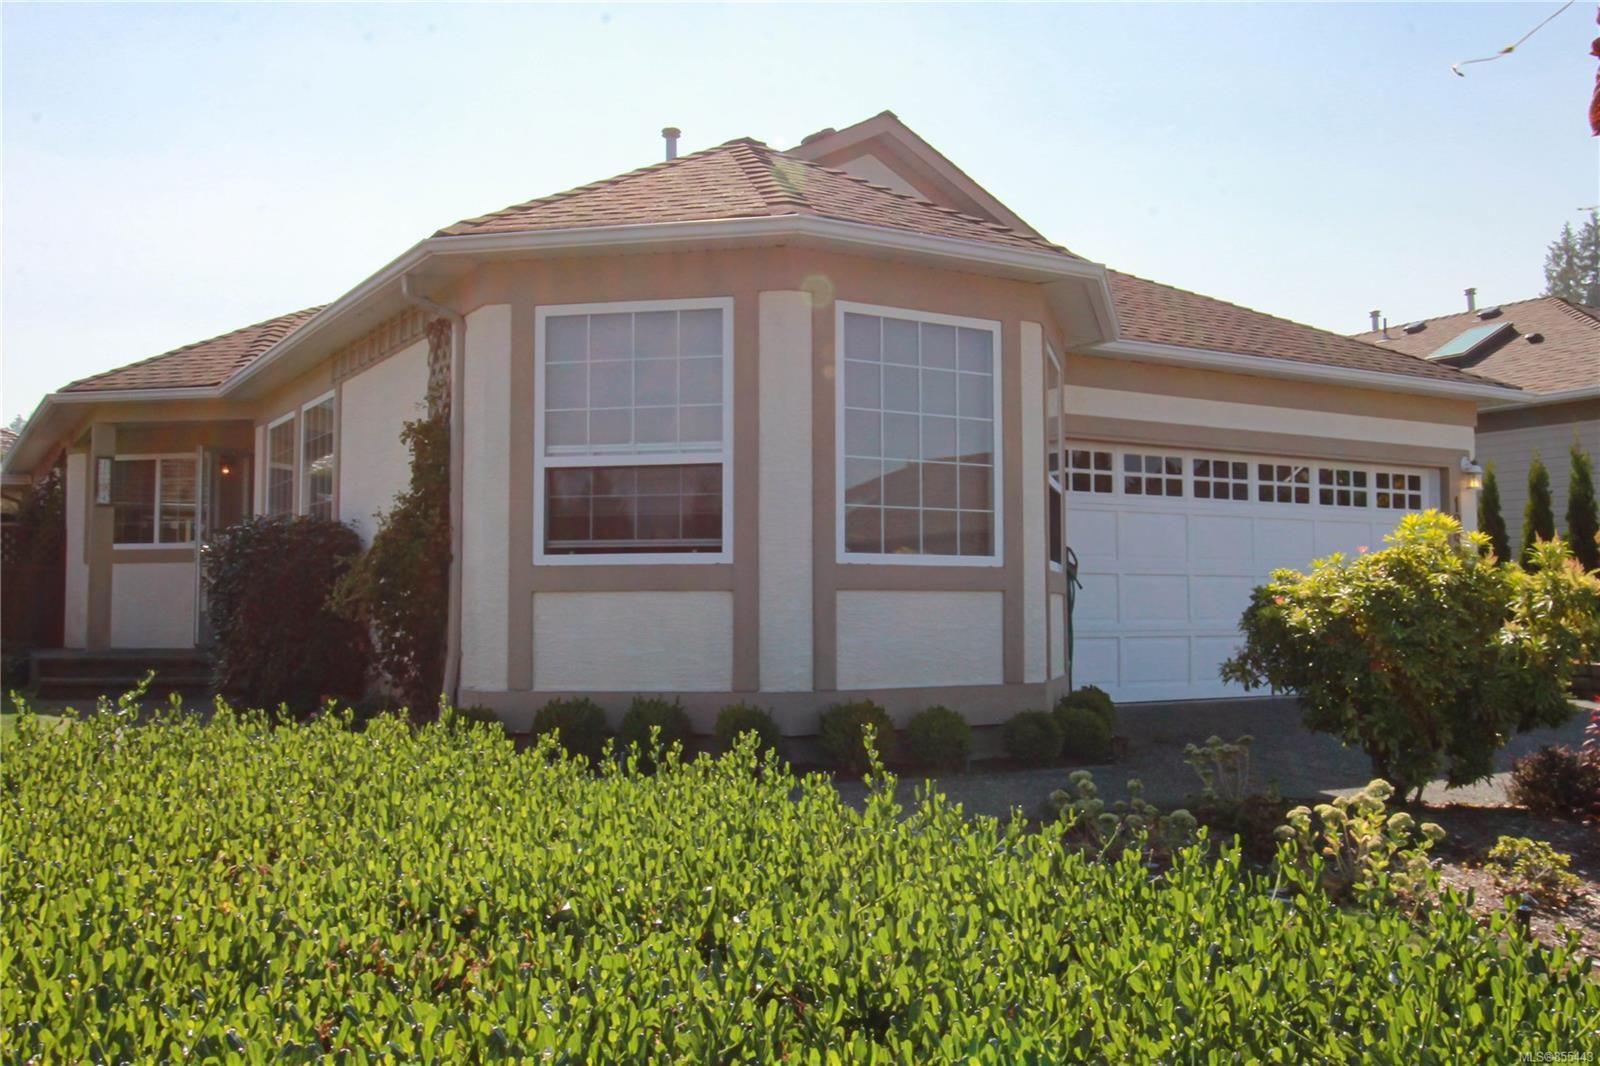 Photo 10: Photos: 1294 Leeward Way in : PQ Qualicum Beach House for sale (Parksville/Qualicum)  : MLS®# 855443